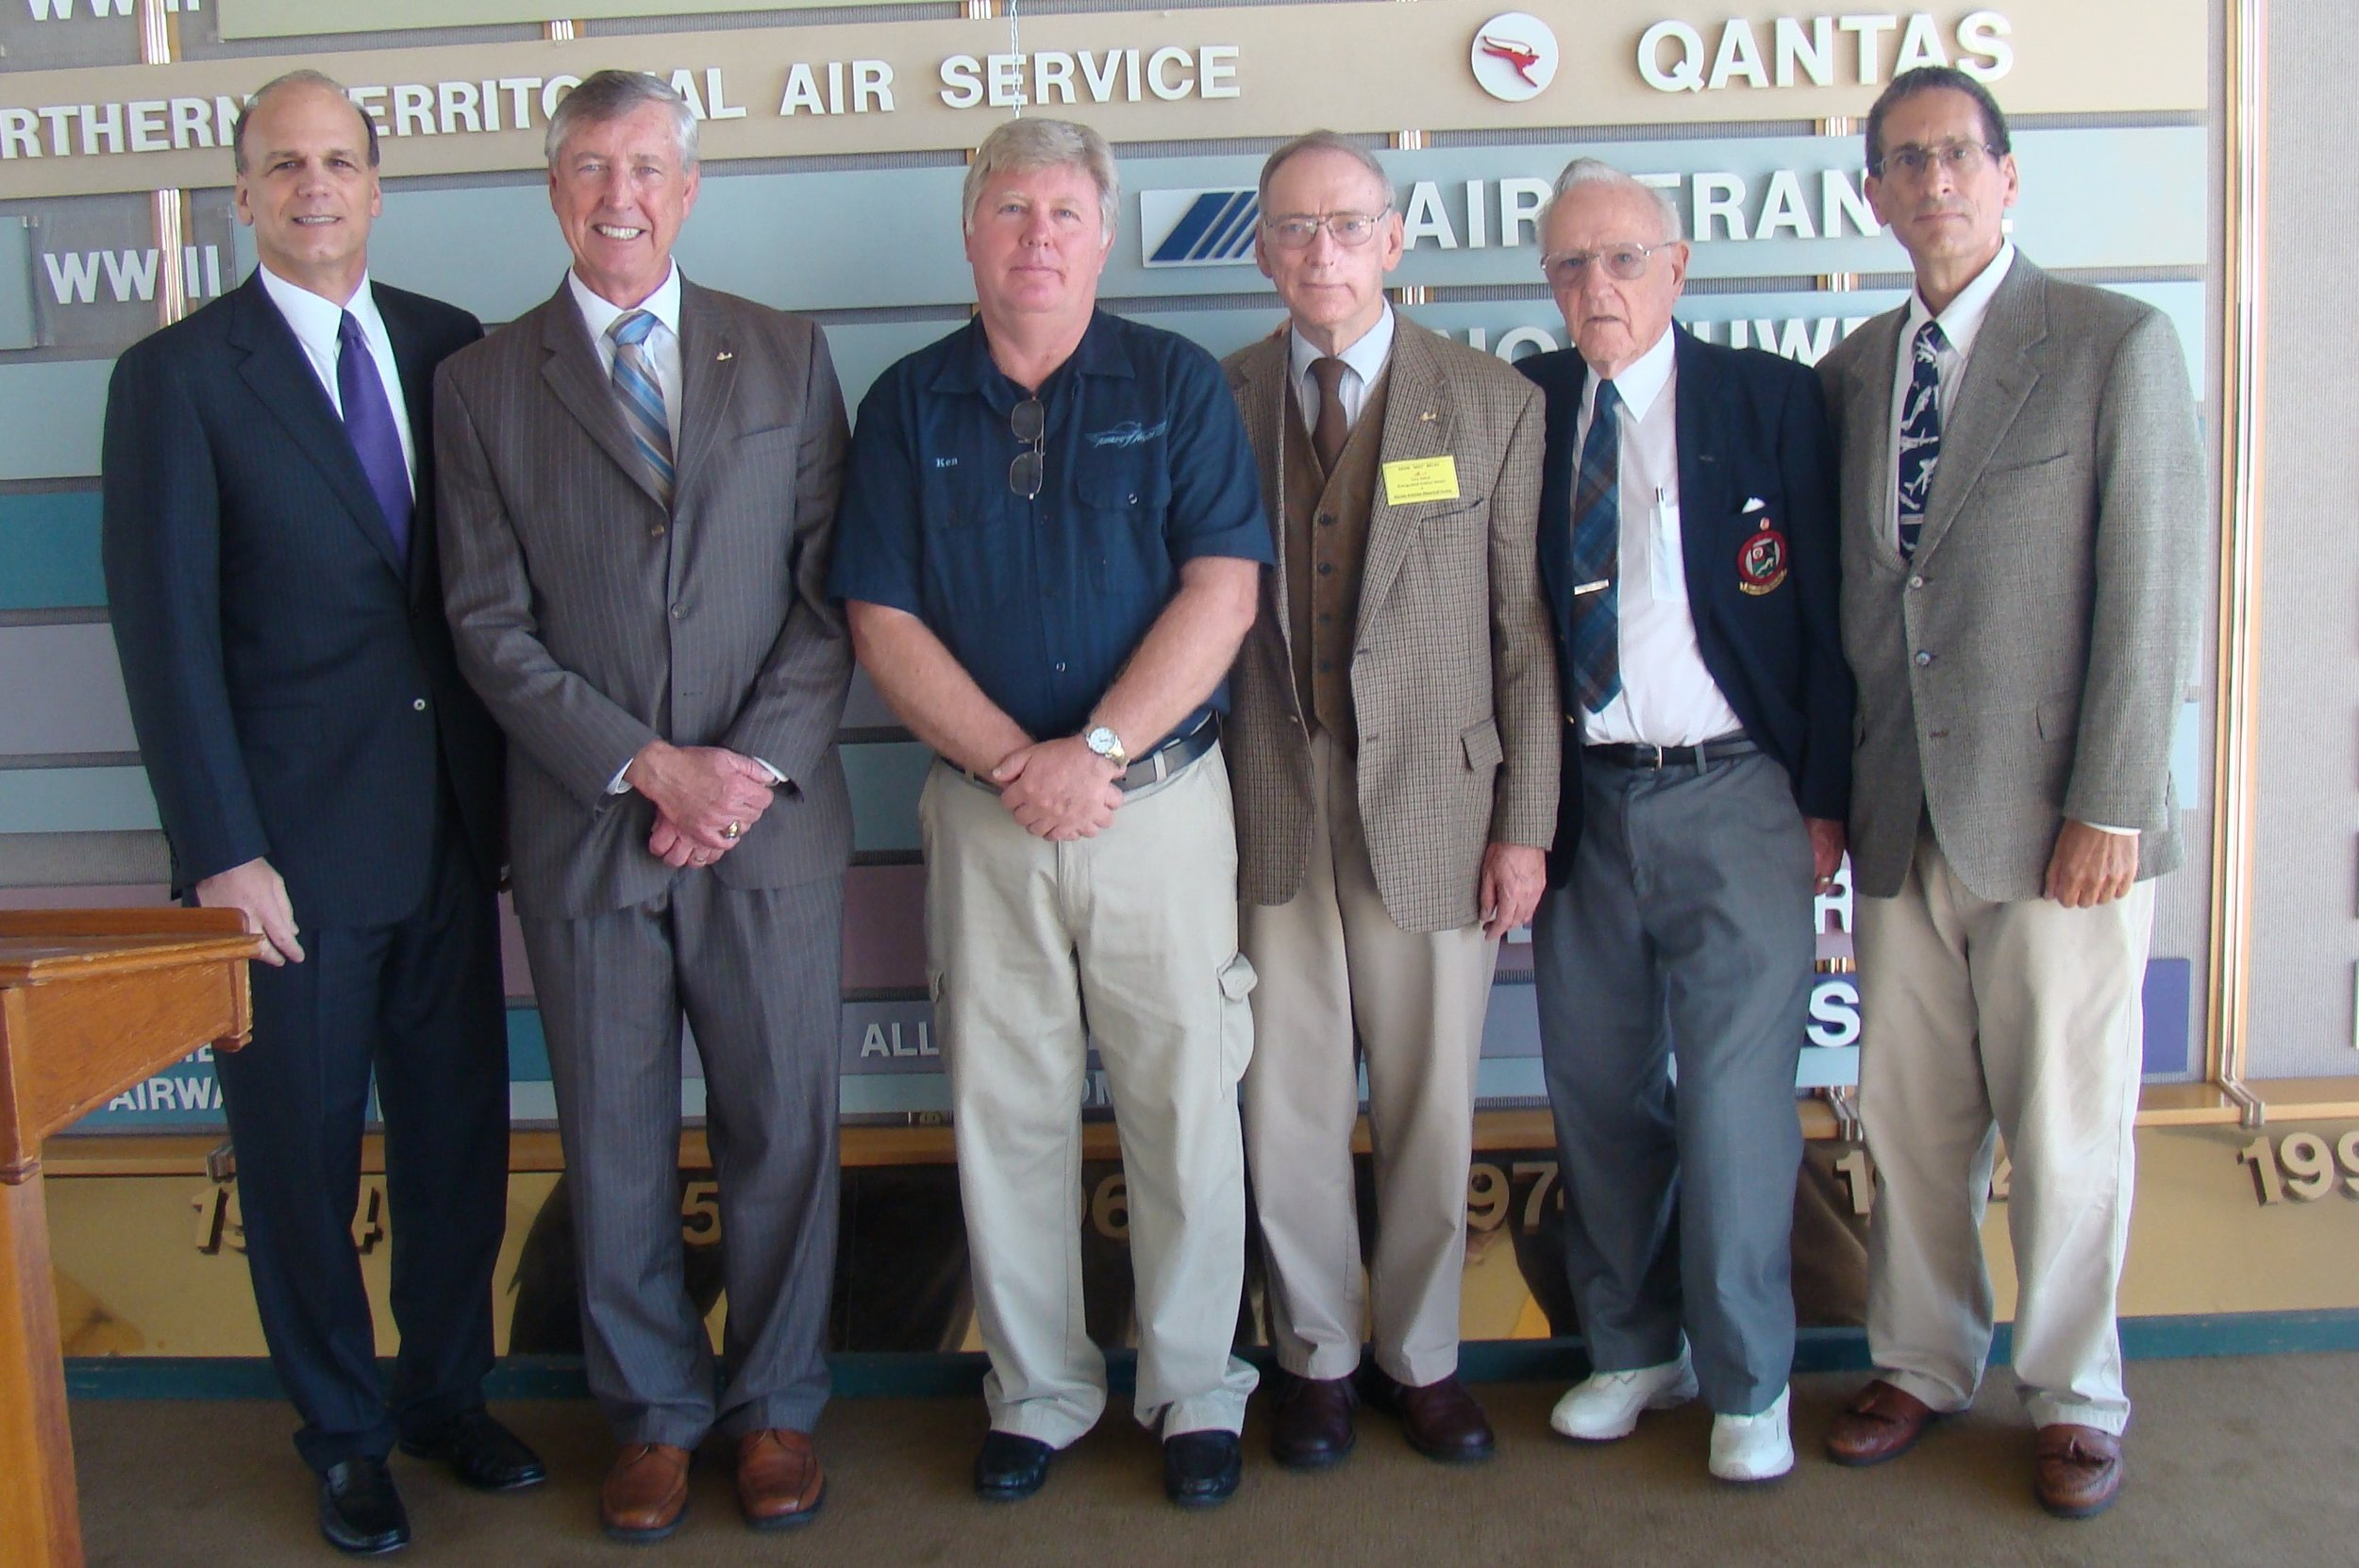 Gary Spulak, Will Michaels, Ken Kellet, David McLay, Warren Brown & Chris Fiore - 2, 14 Mar '12.JPG